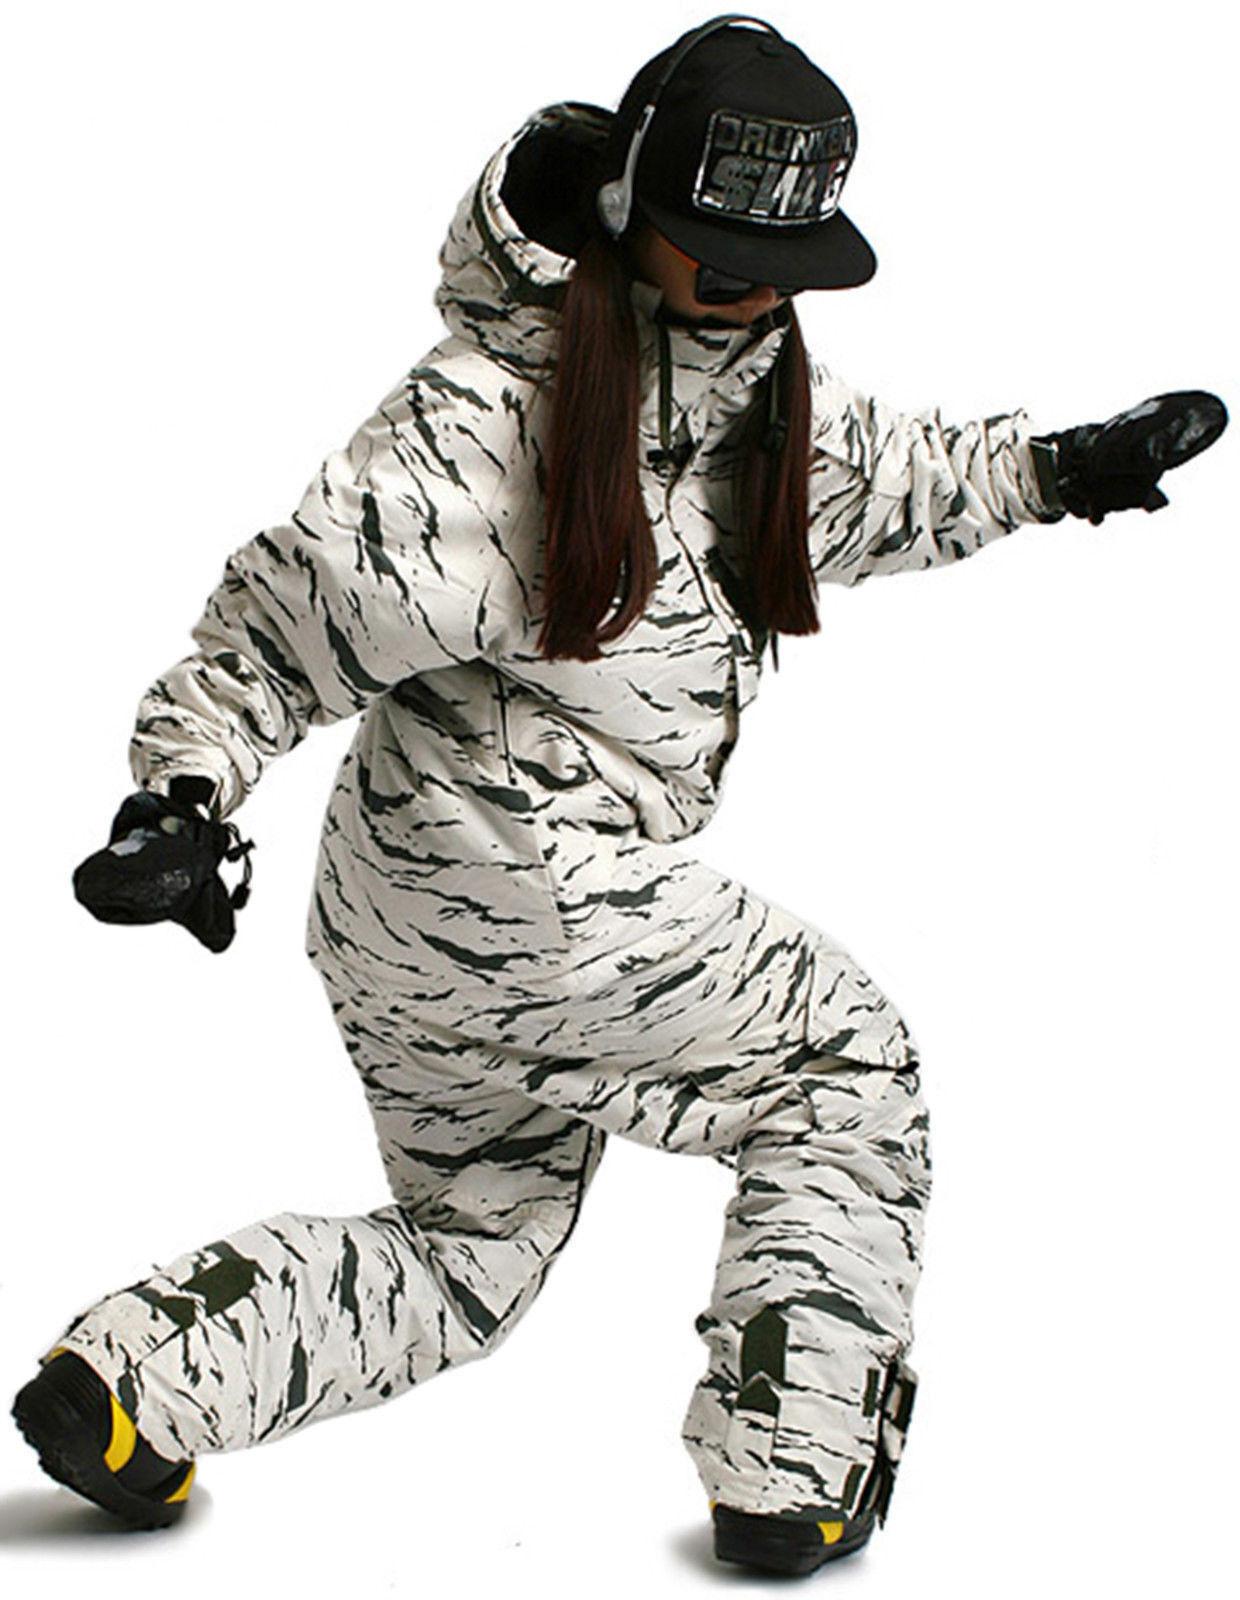 2019 SouthPlay Waterproof Ski-Snowboard Militarylook Desert Desert Desert Jacket +Pants set 11f7f2